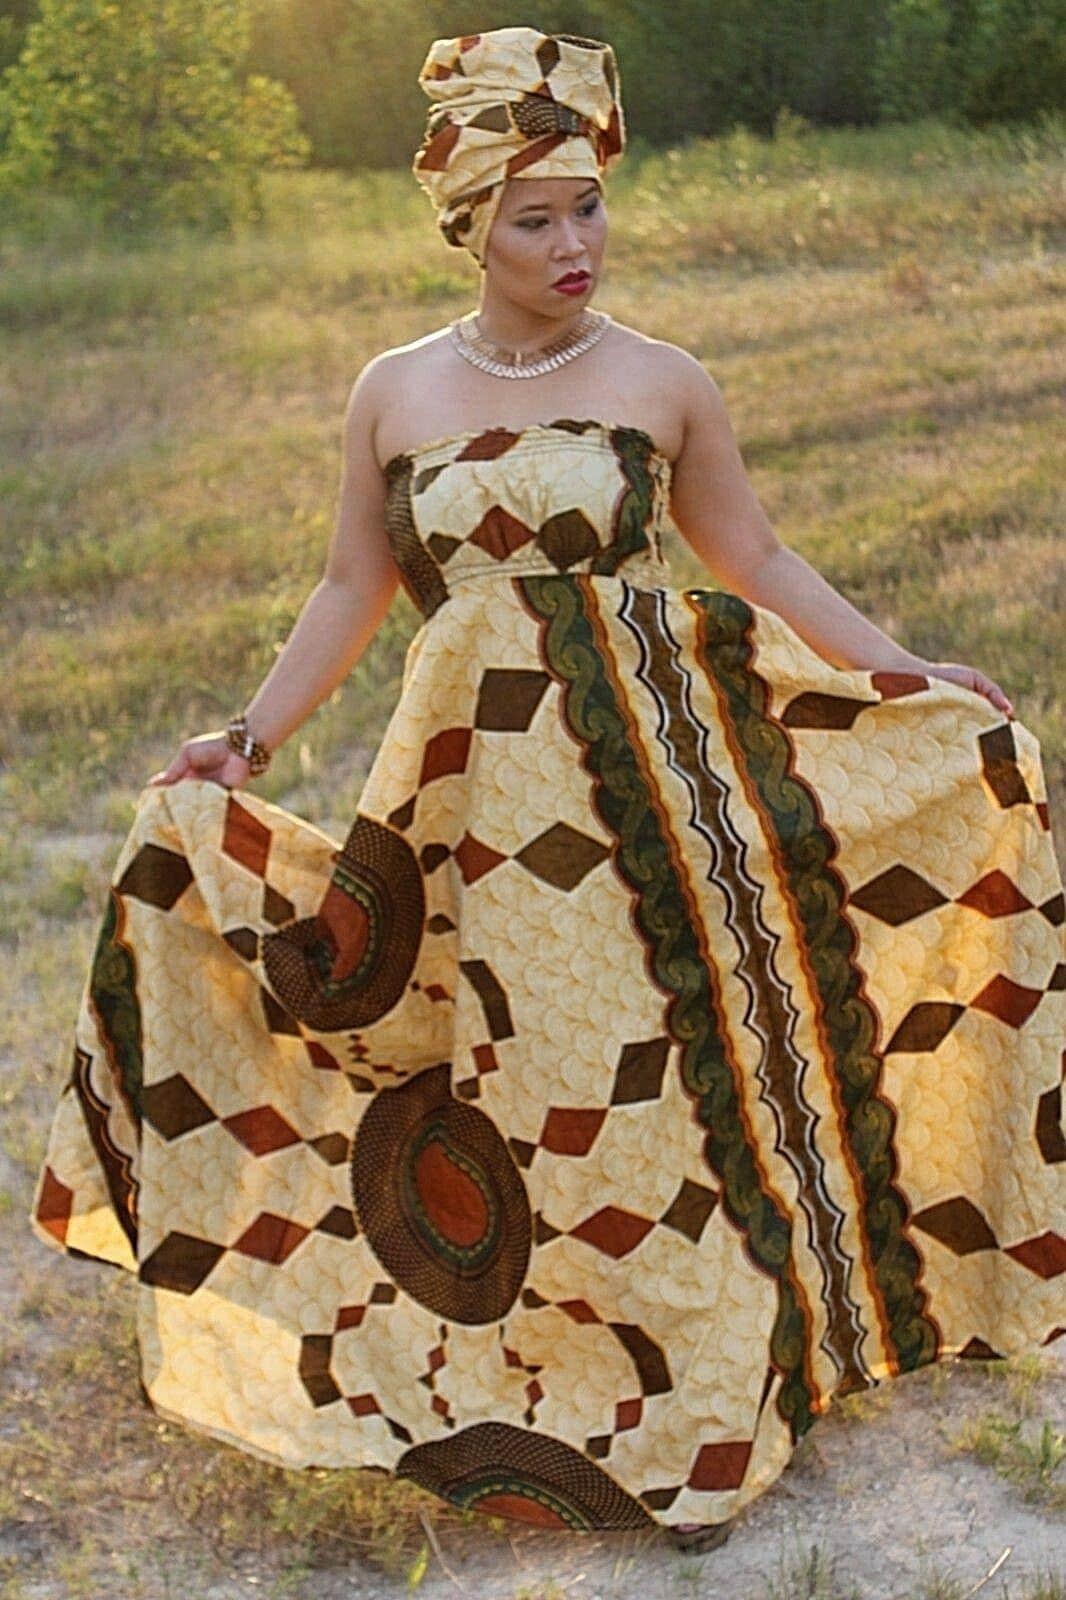 African print dress from ebay by Oludan designs